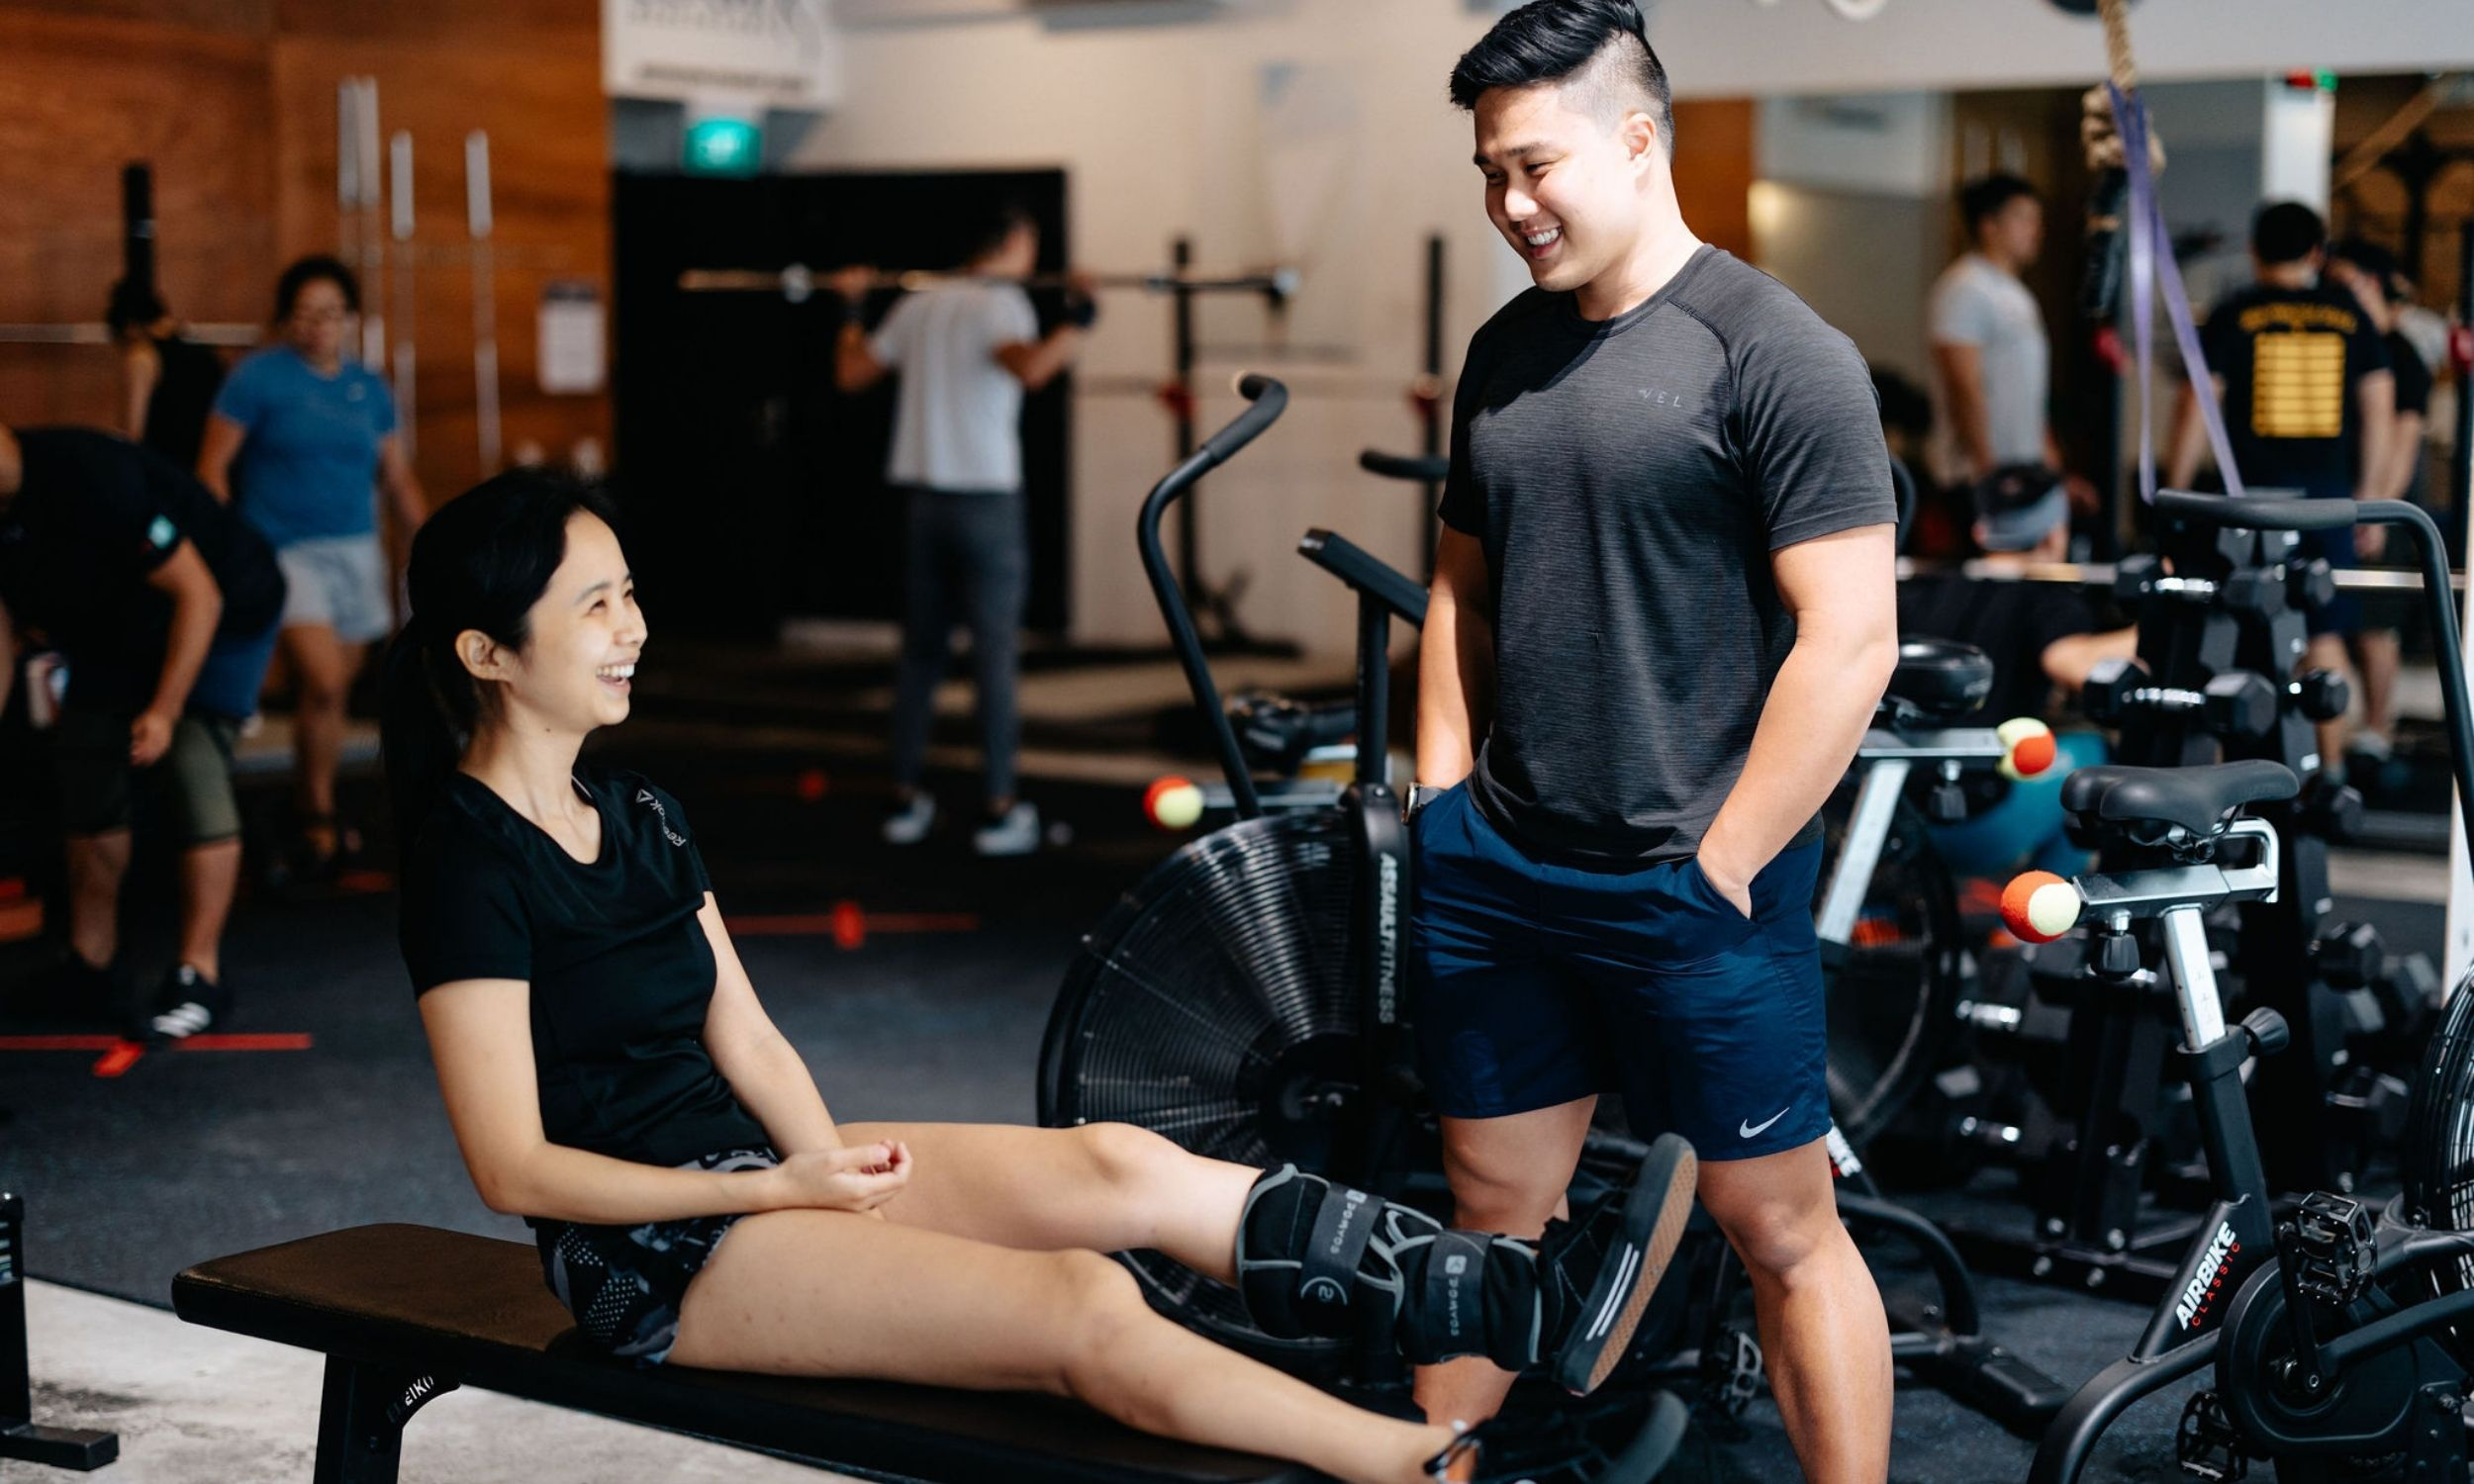 Personal Training For Injury Rehabilitation